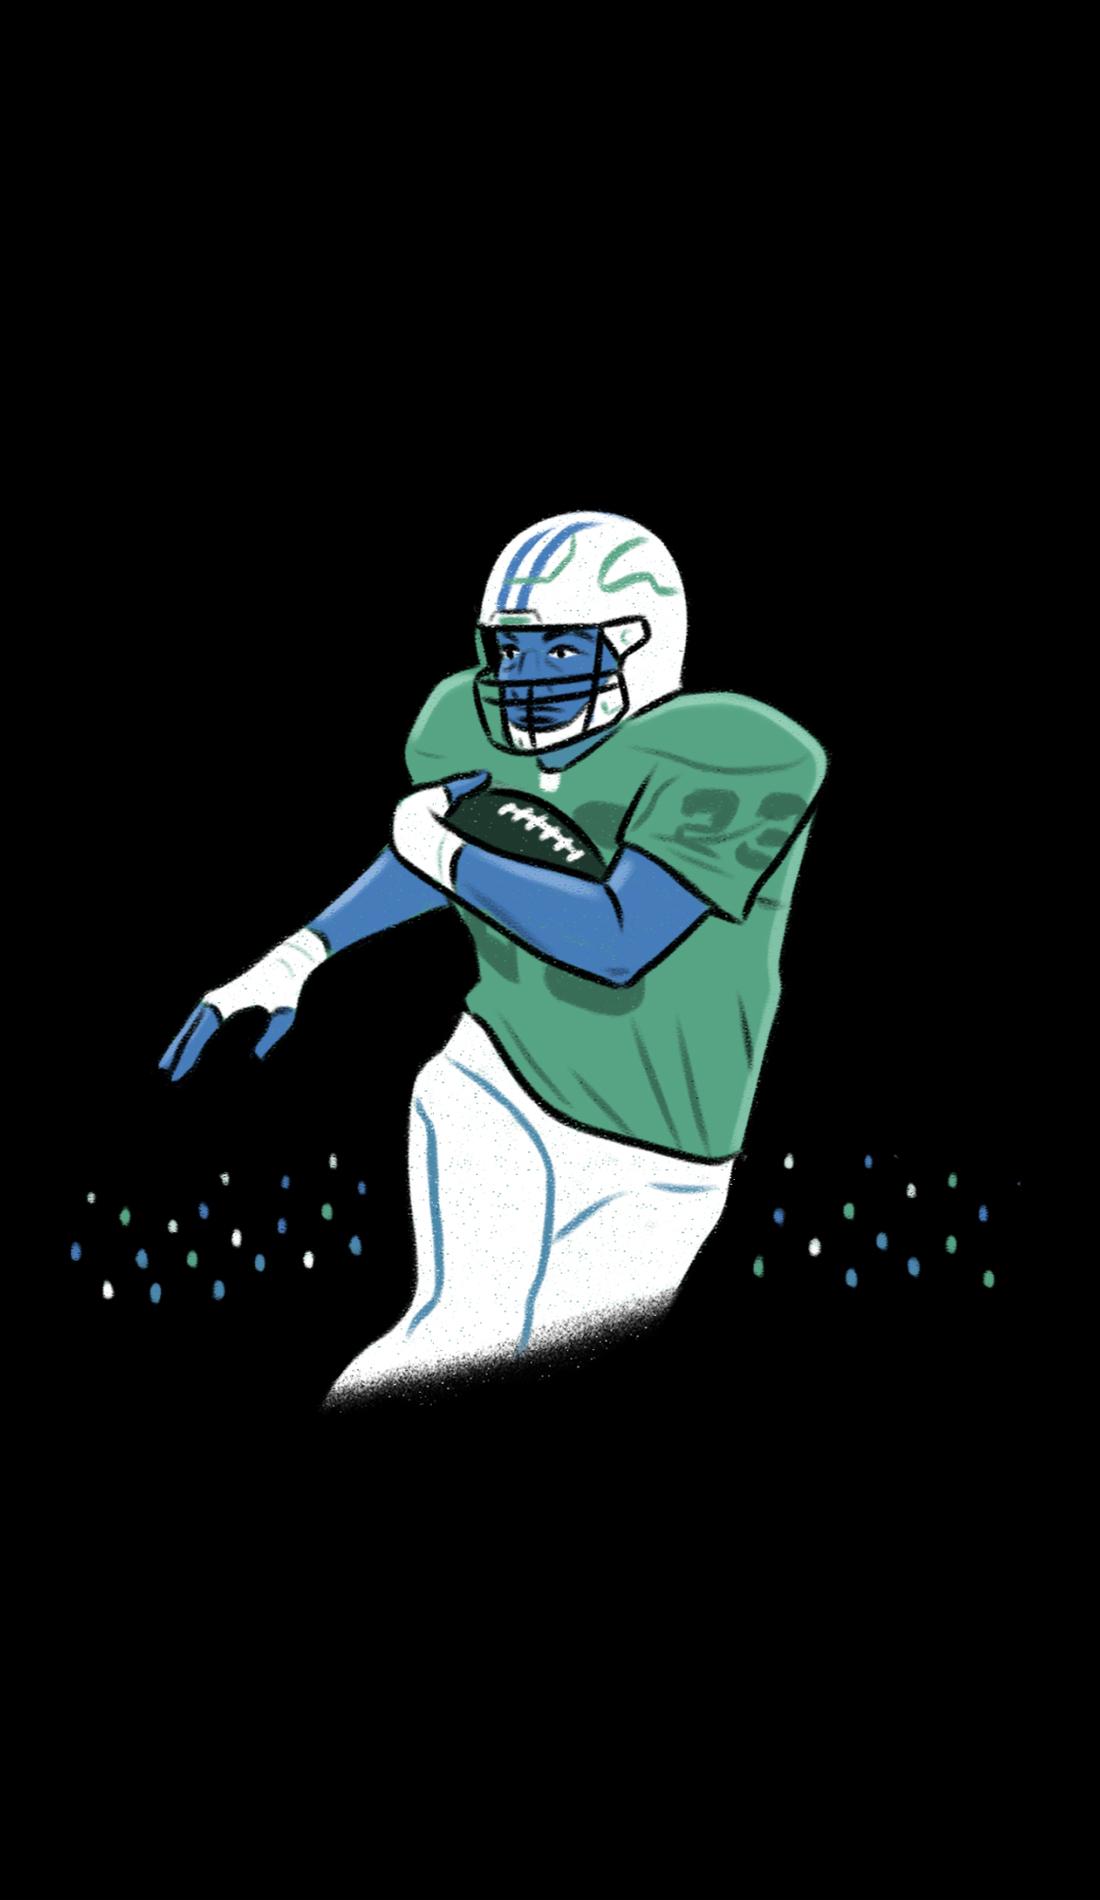 A Liberty Bowl live event